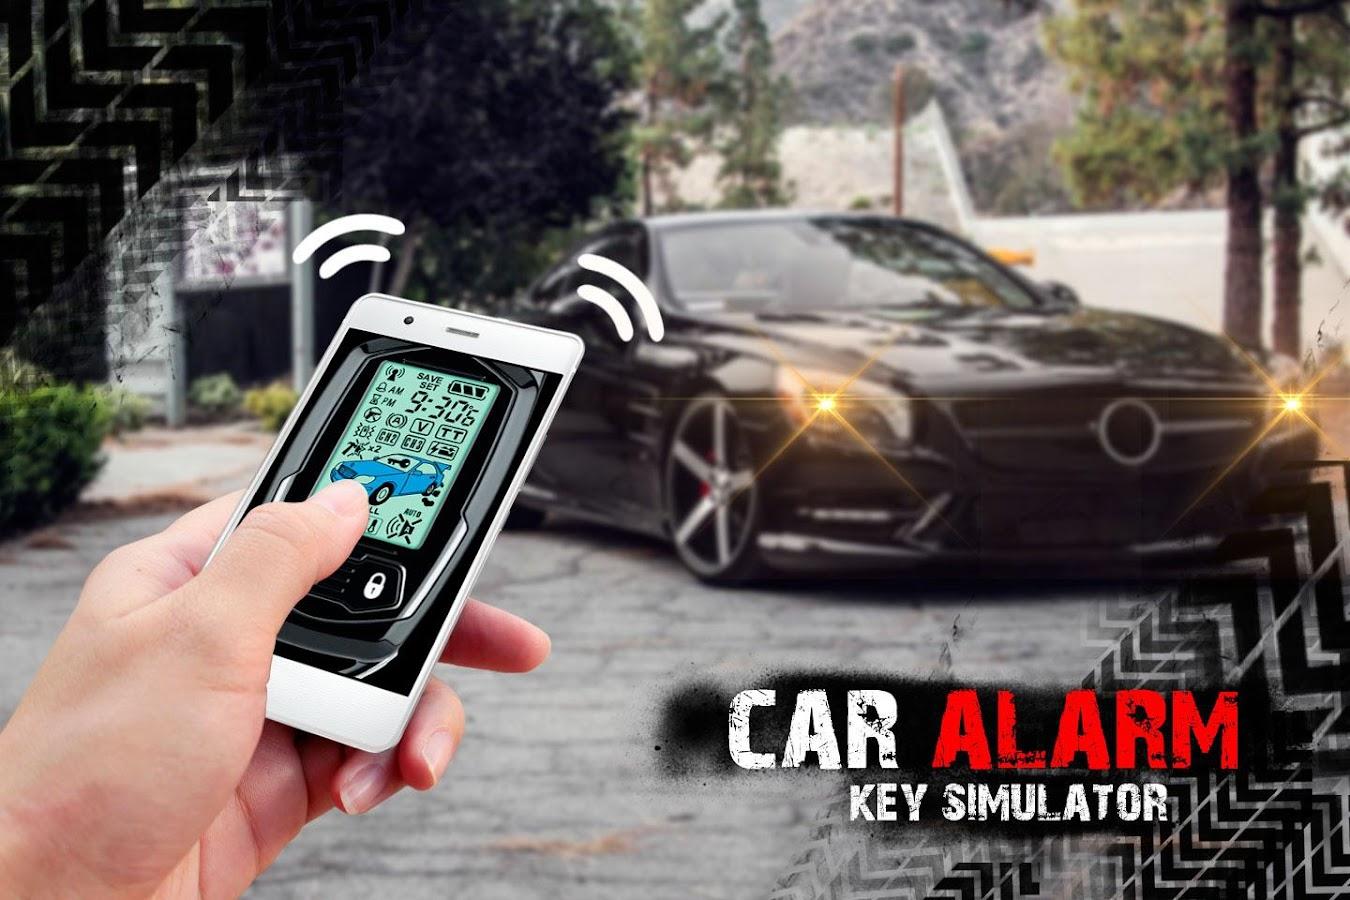 car alarm key simulator android apps on google play. Black Bedroom Furniture Sets. Home Design Ideas